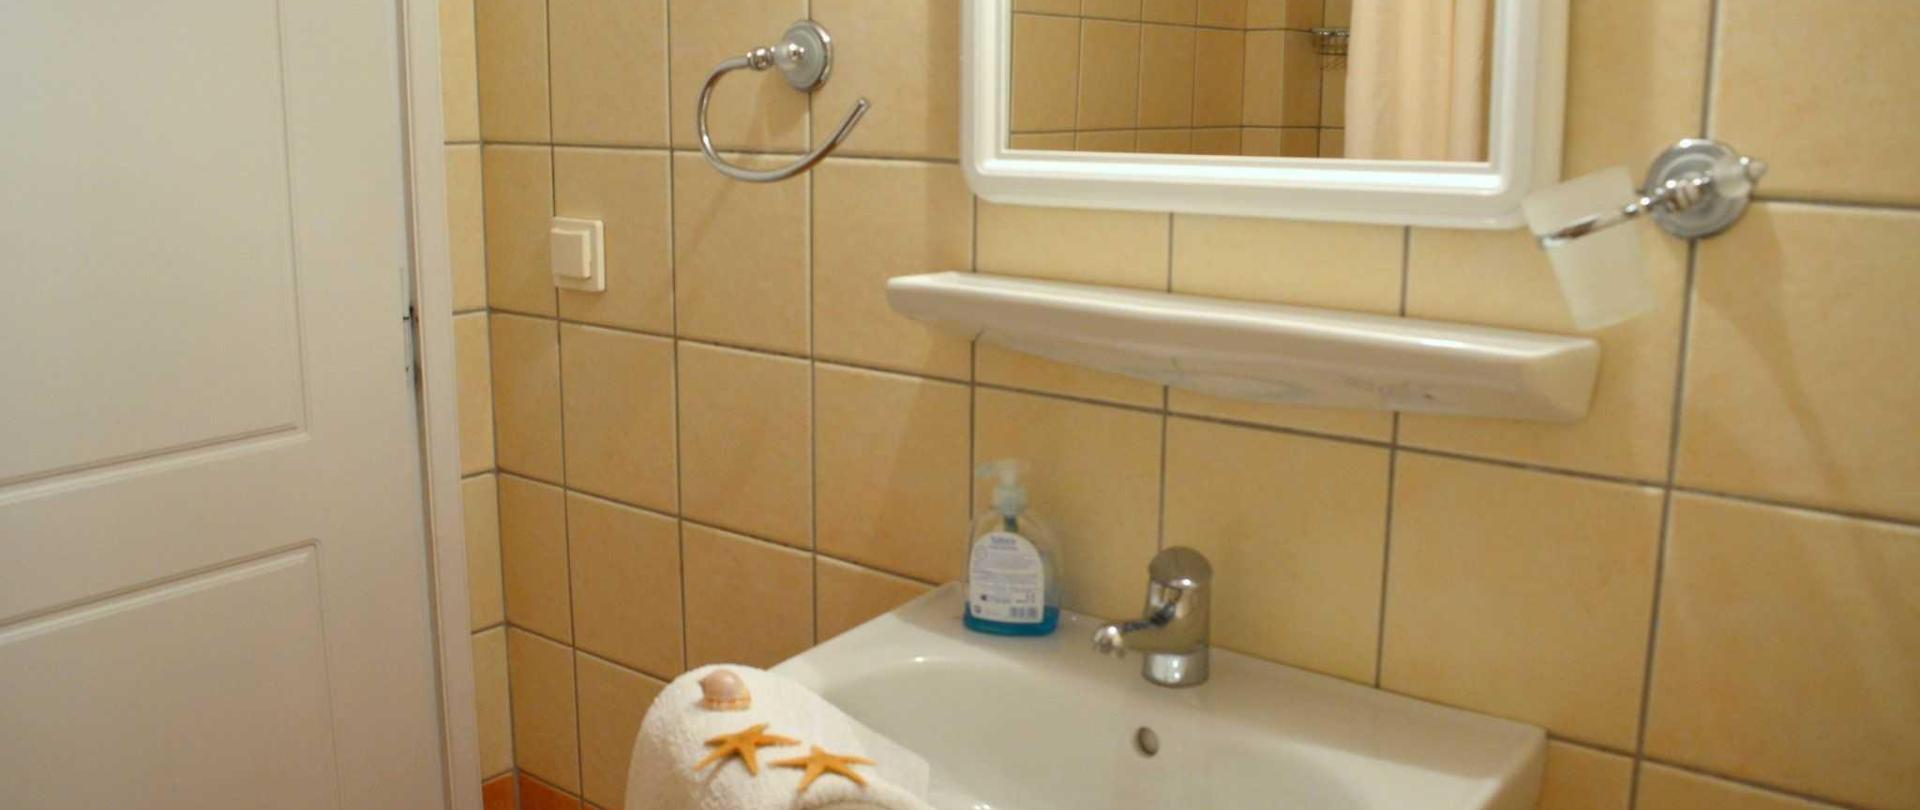 studio-2-bath.JPG